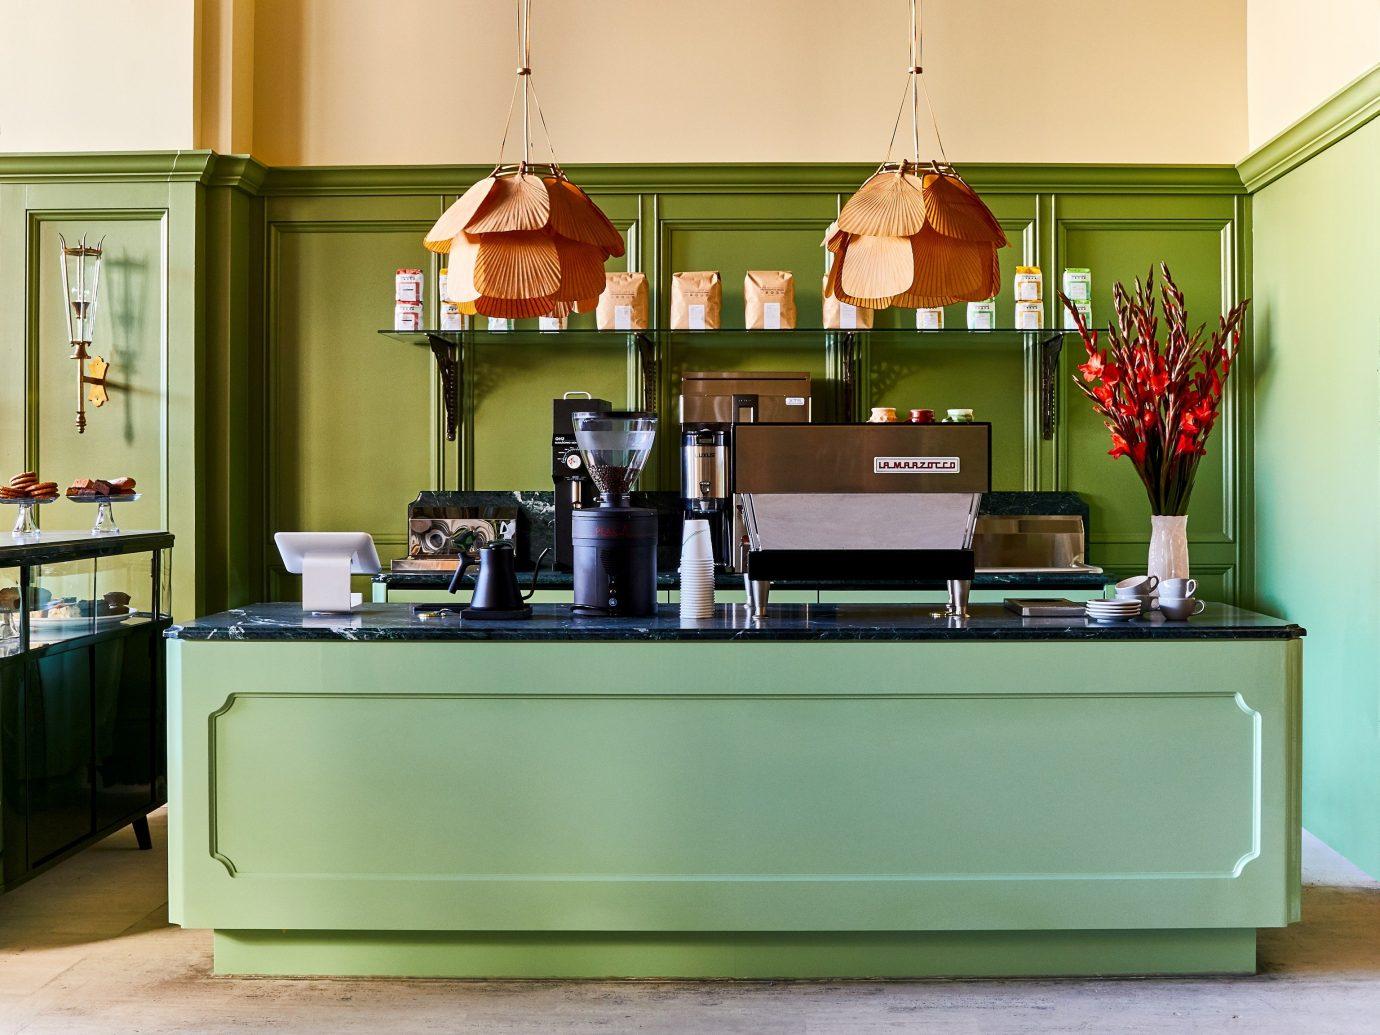 Detroit Influencers + Tastemakers Trip Ideas wall indoor floor furniture room table Living interior design